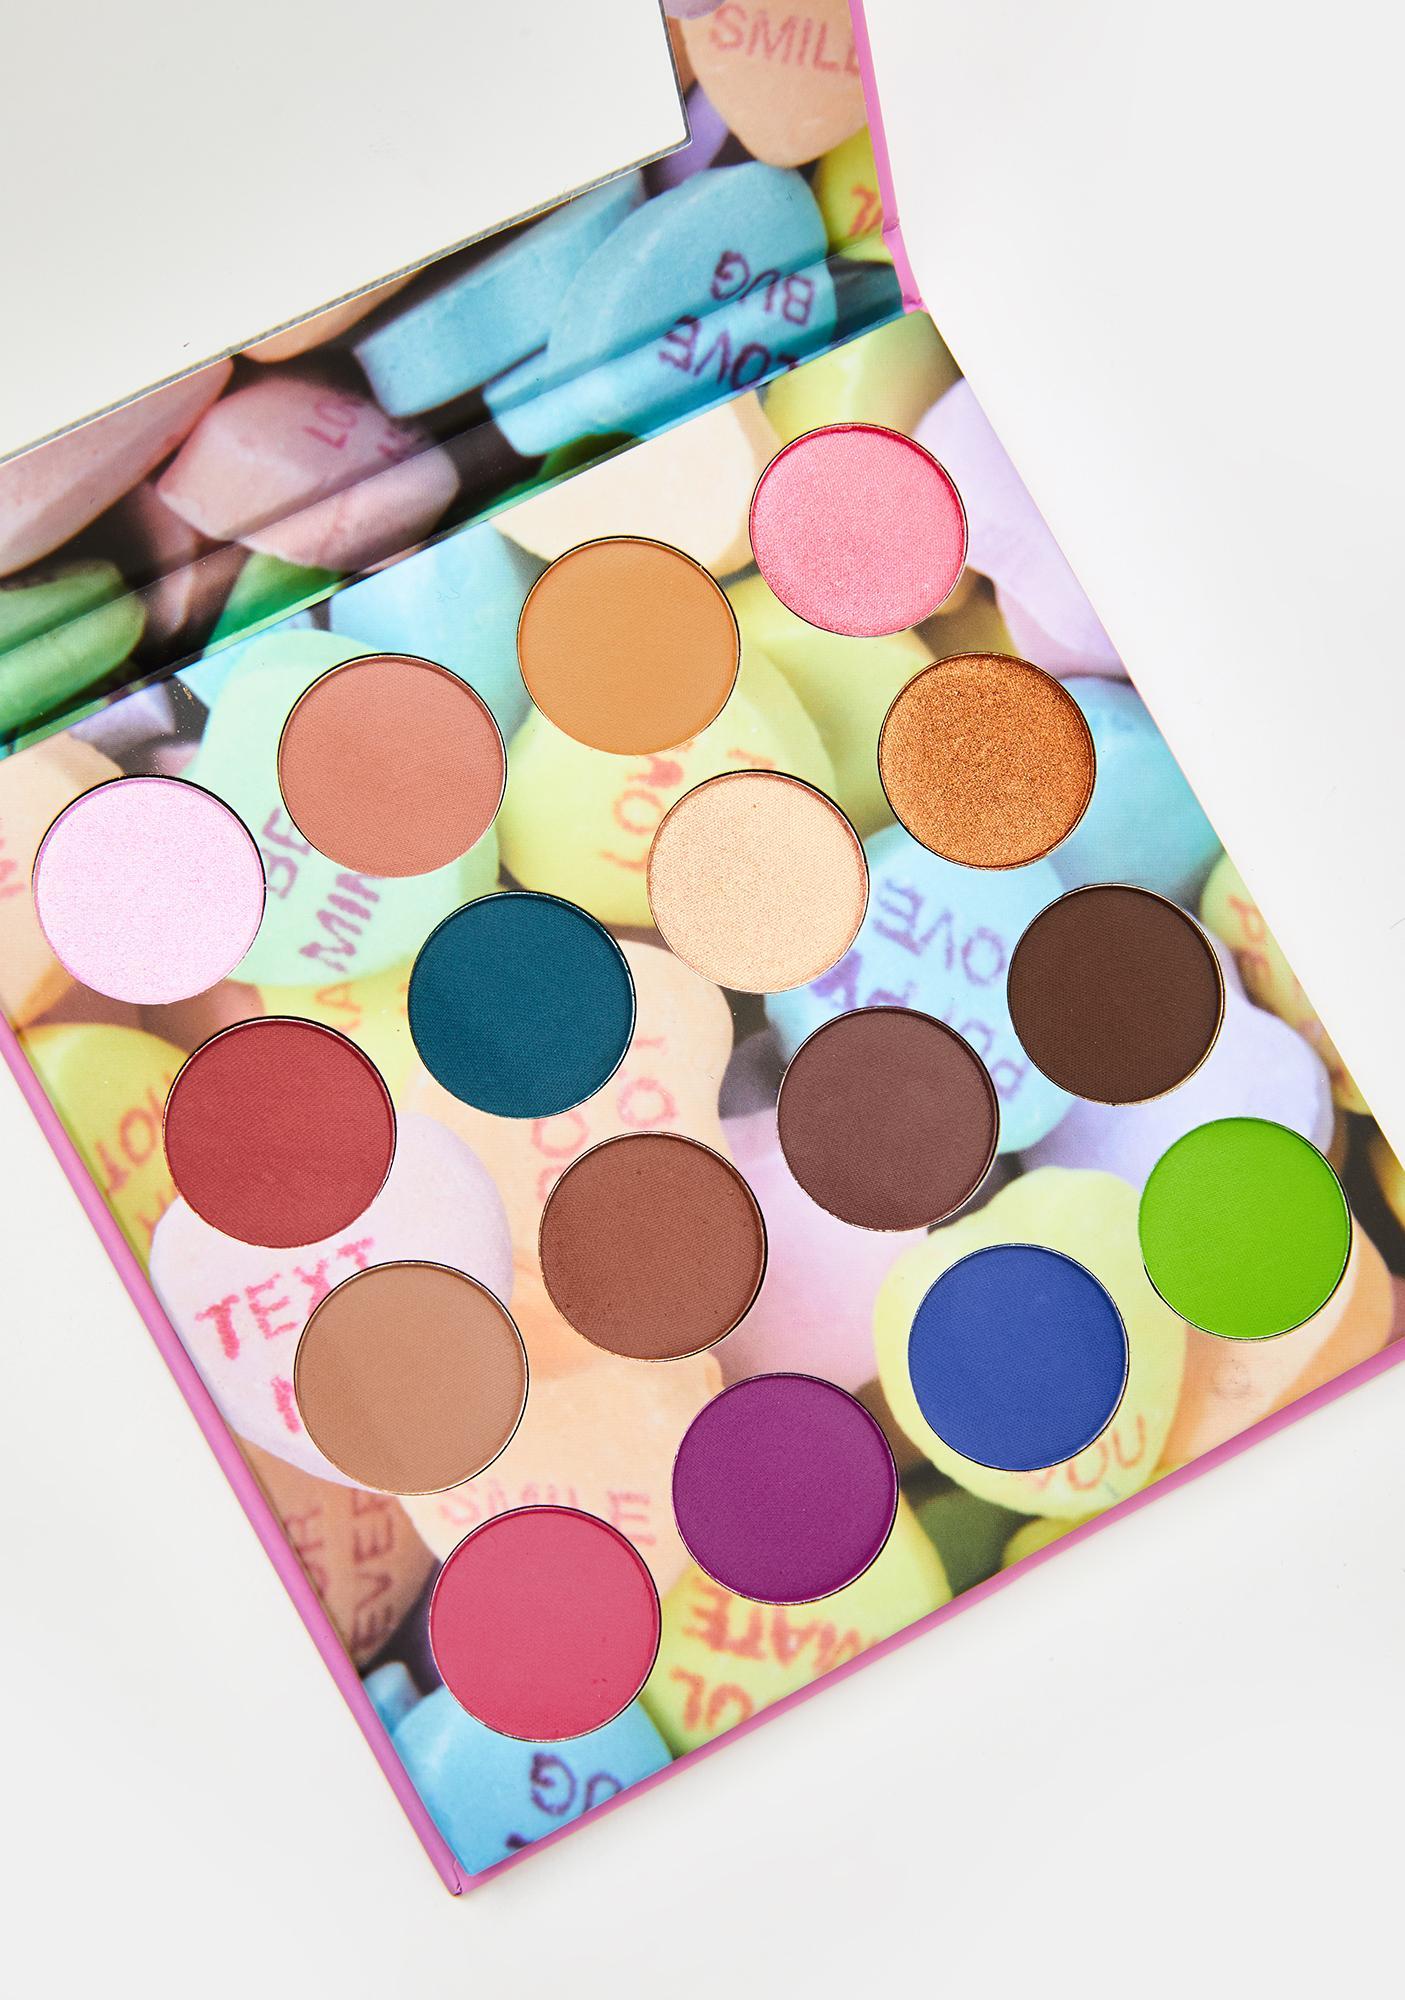 Spoiled Lips Cosmetics Love Sucks Vol. 8 Eyeshadow Palette